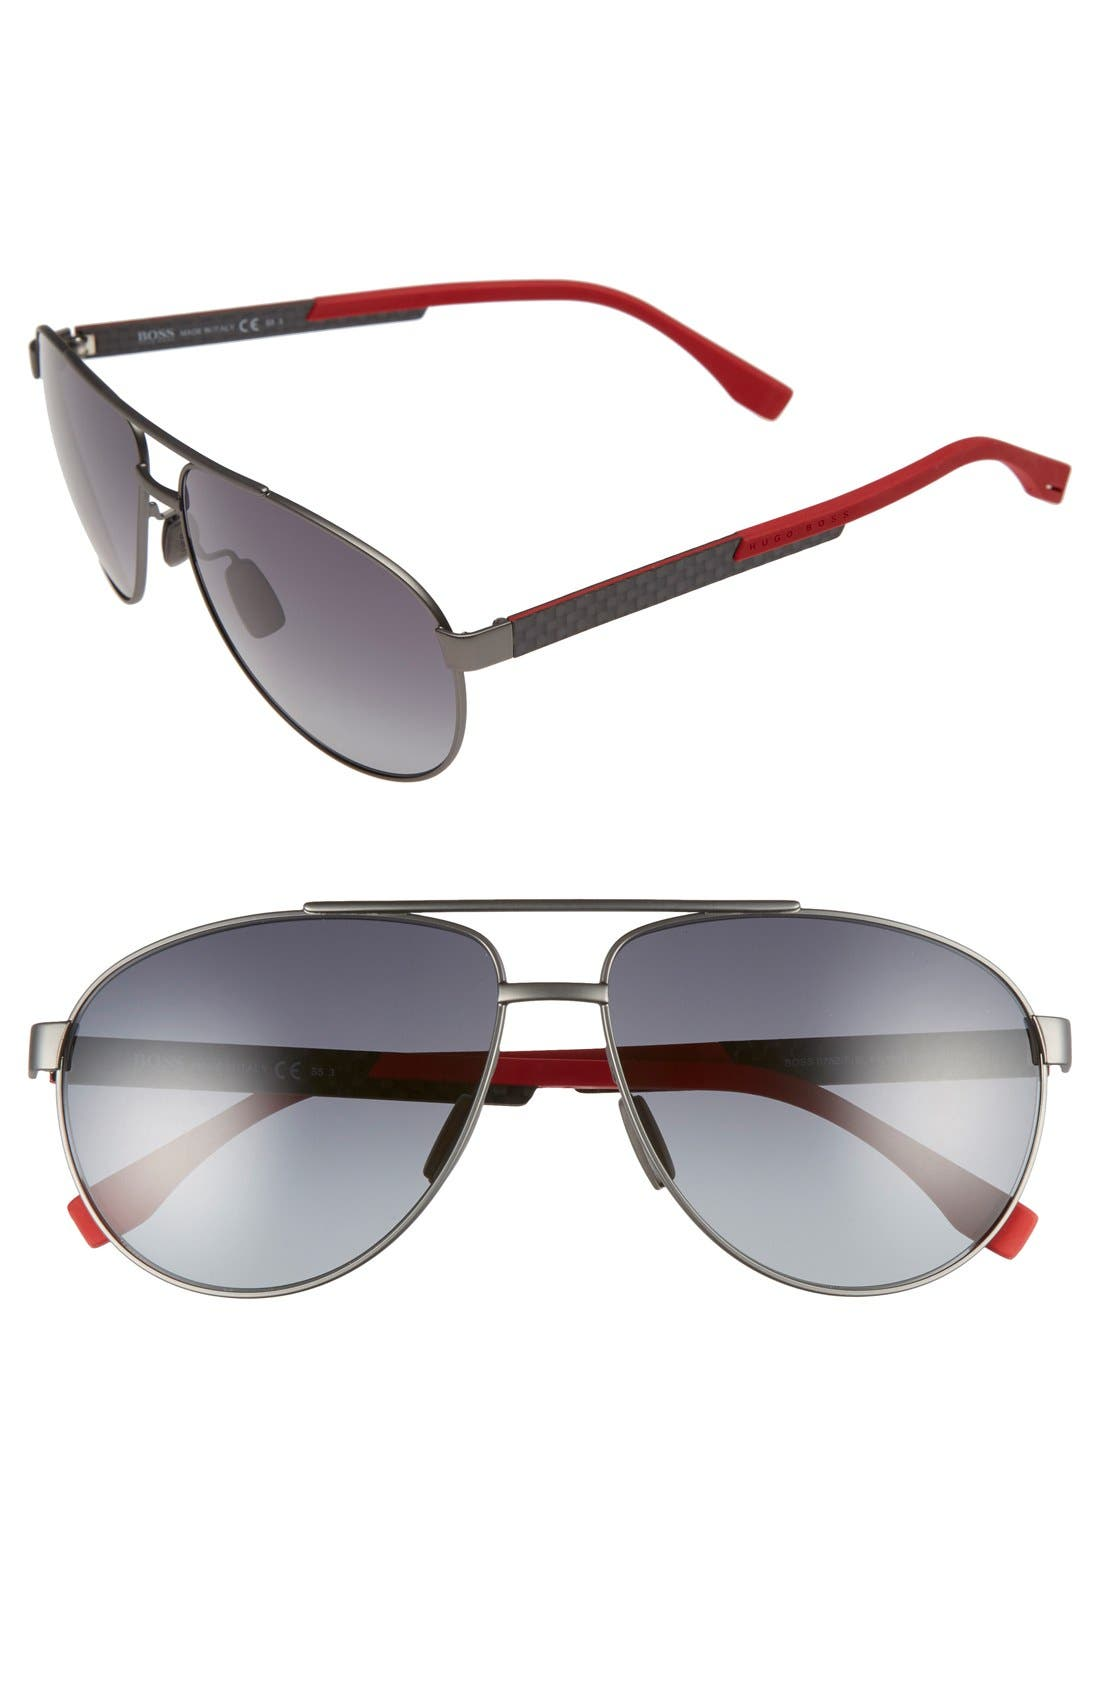 63mm Aviator Sunglasses,                             Main thumbnail 1, color,                             043